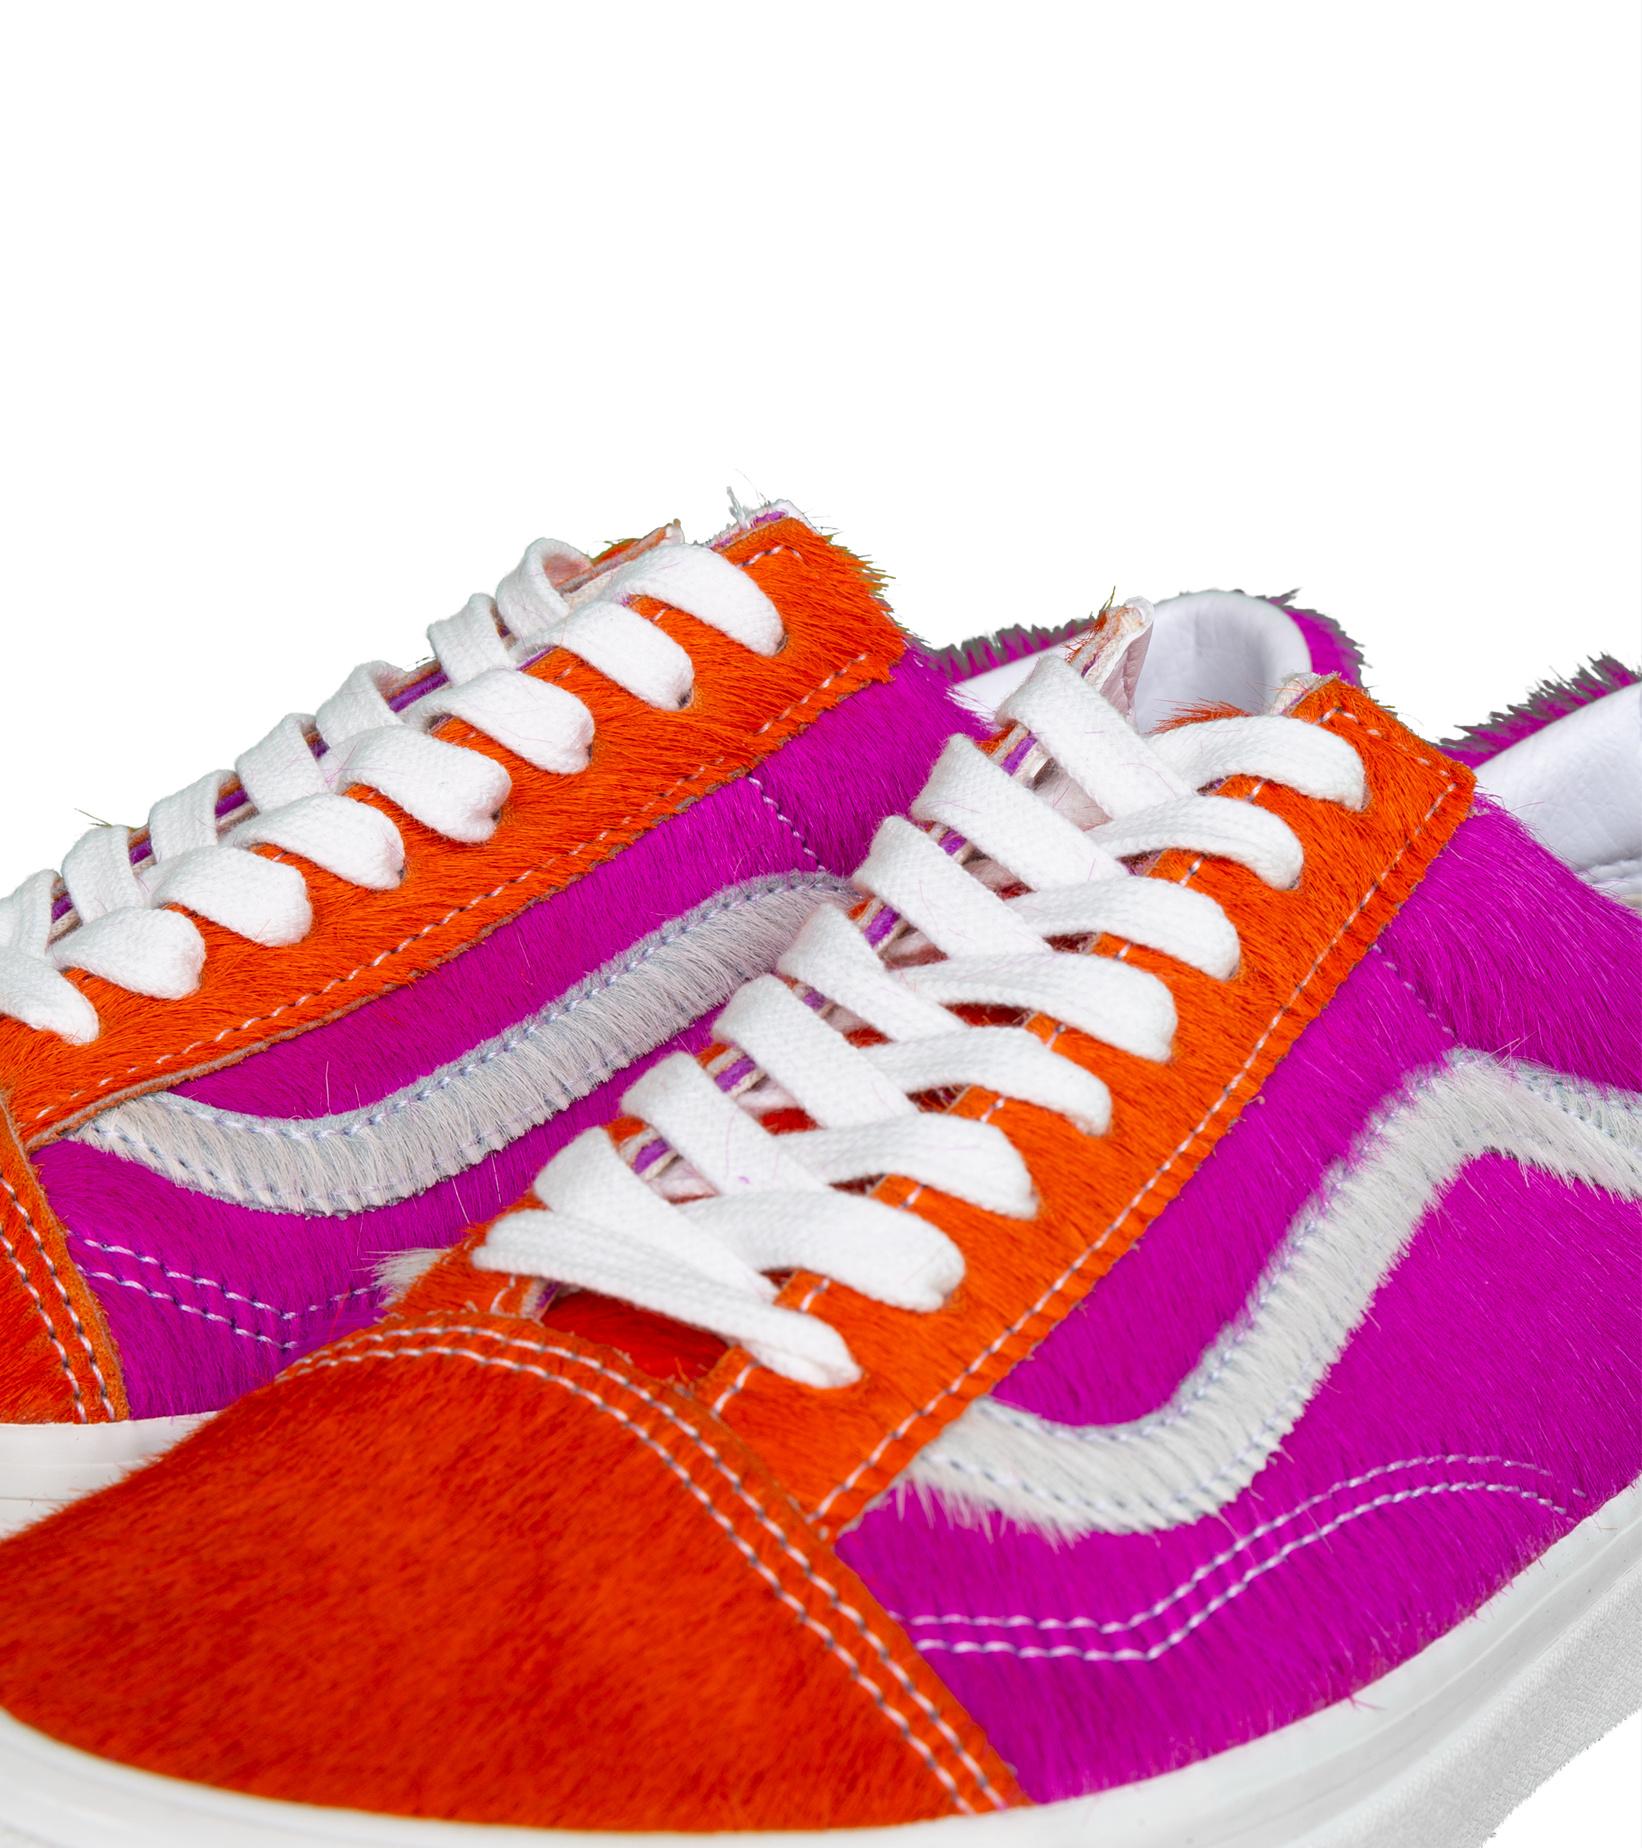 "Old Skool 36 DX (Anaheim Factory) ""Pink Pony/True White""-6"